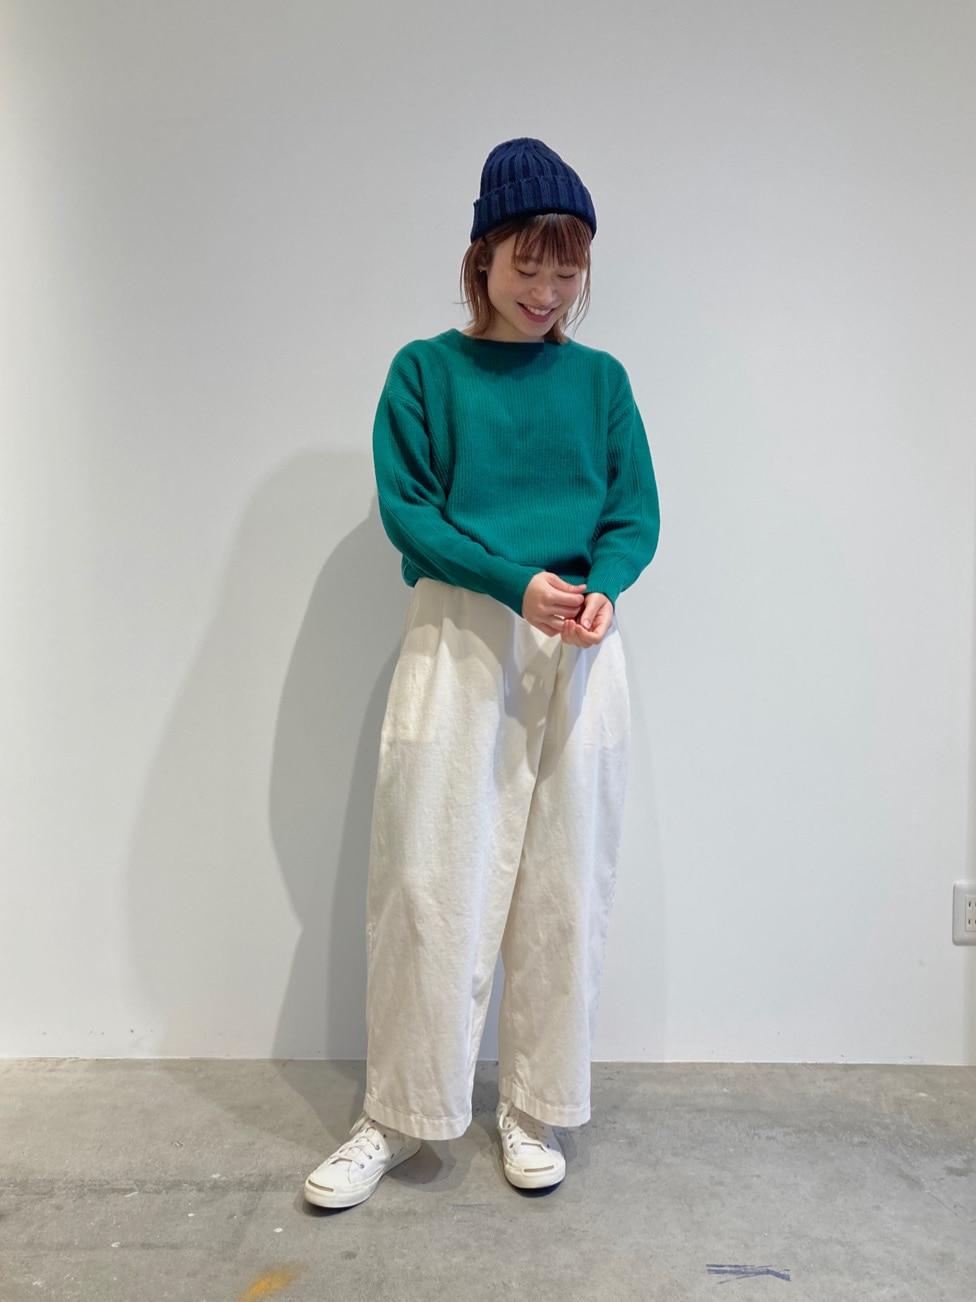 FLAT AMB 名古屋栄路面 2020.11.13